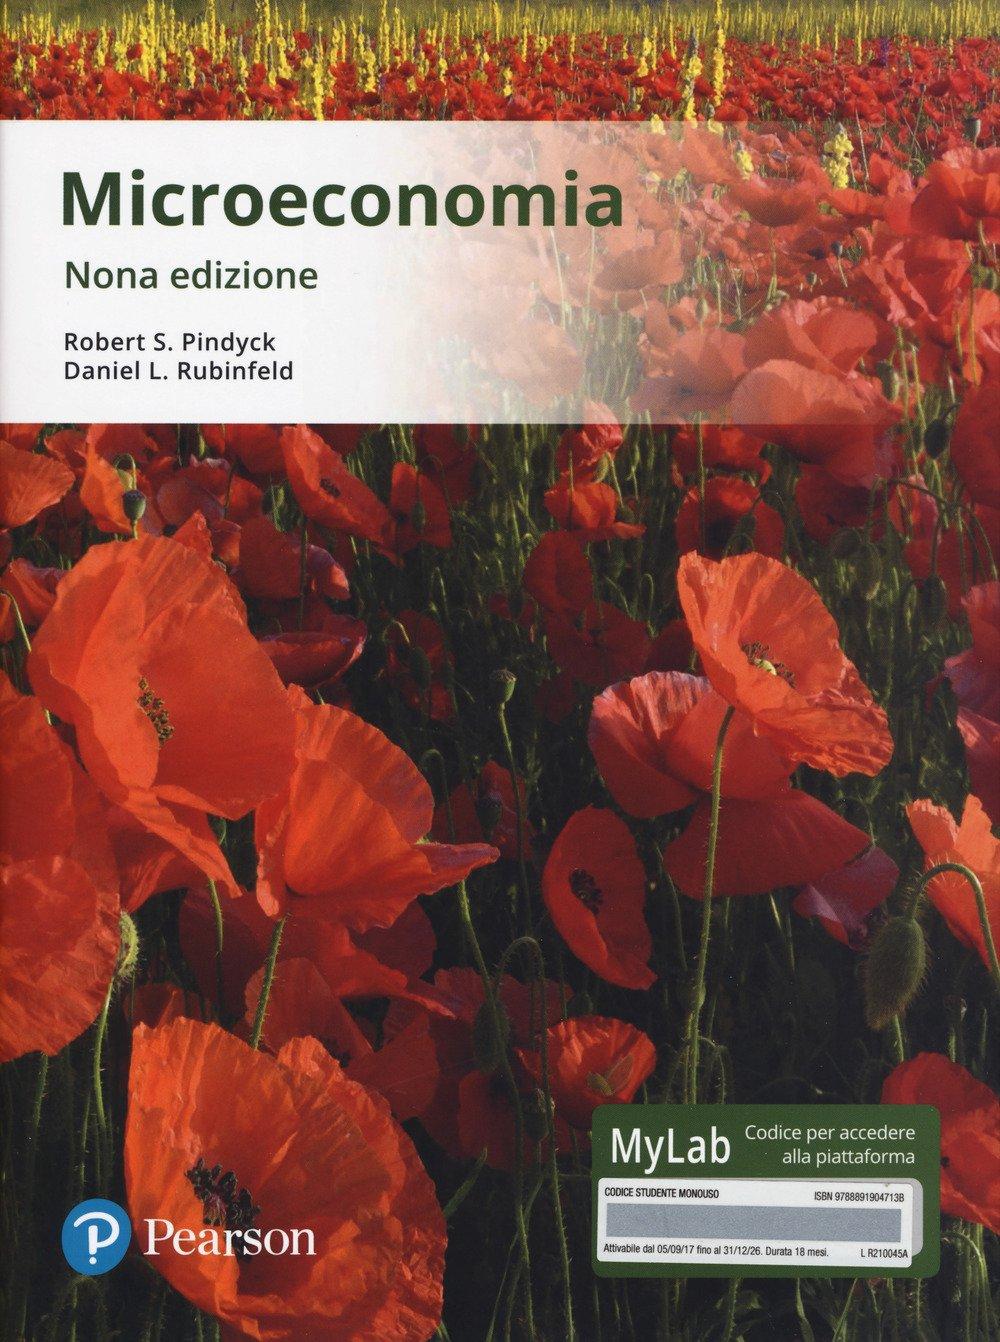 Microeconomia pyndik